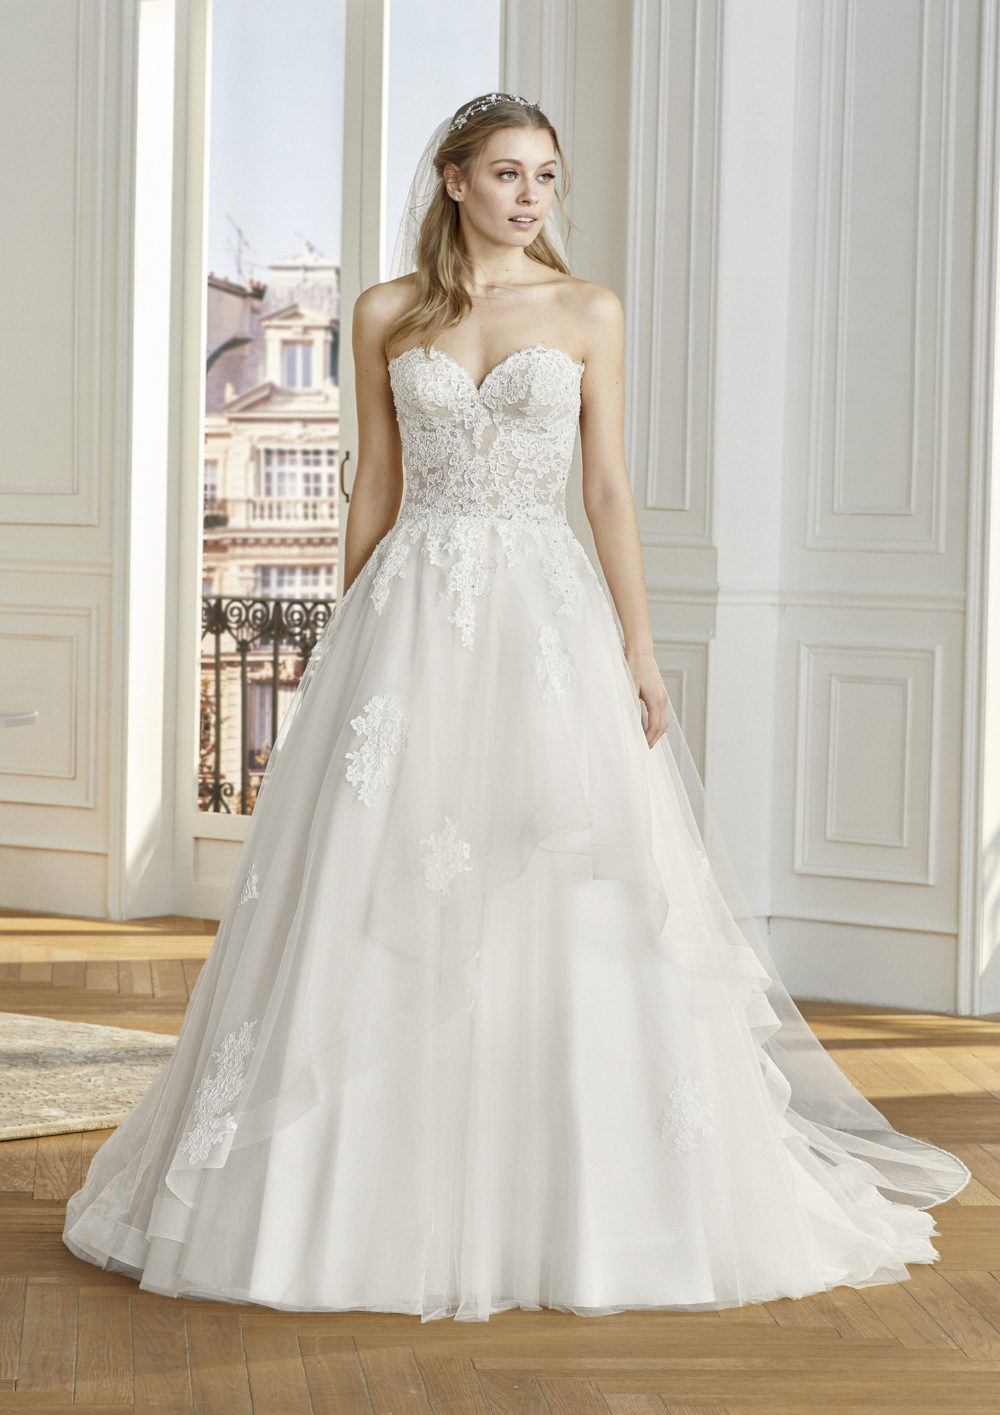 Mariages: abito da sposa San Patrick 2020 a Vicenza, Verona, Padova, Veneto CARRIERES